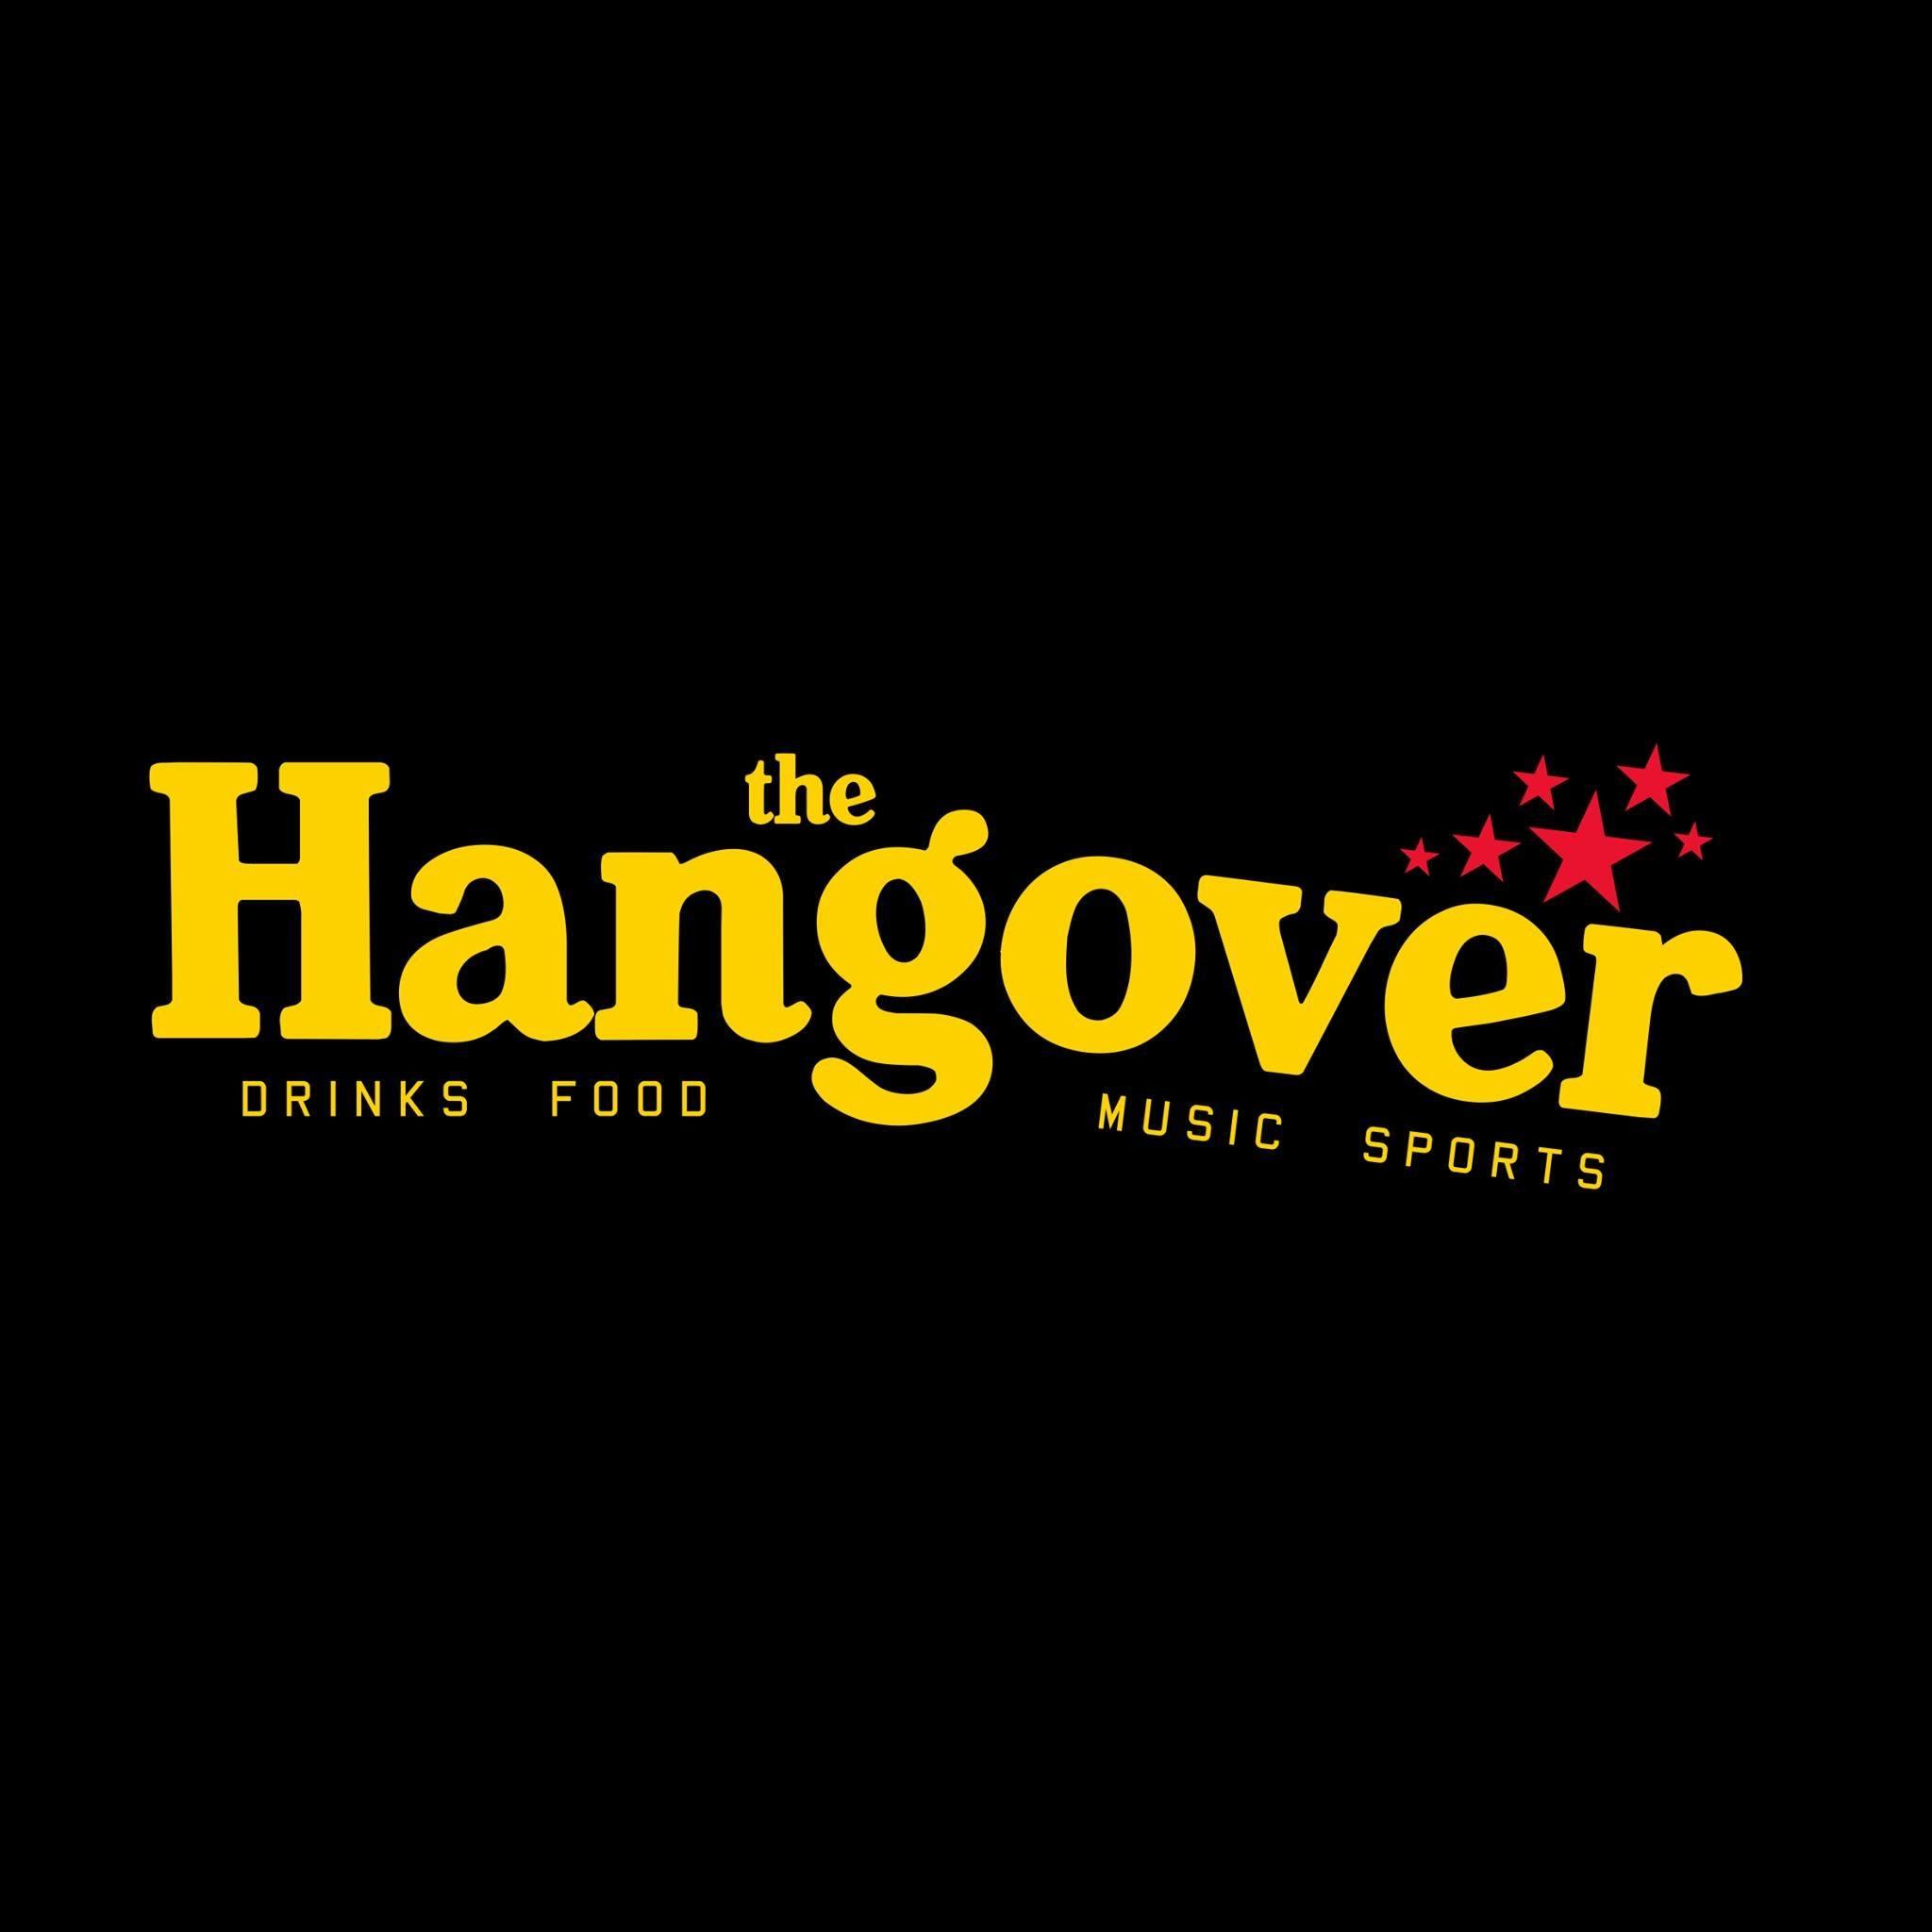 the hangover bangkok